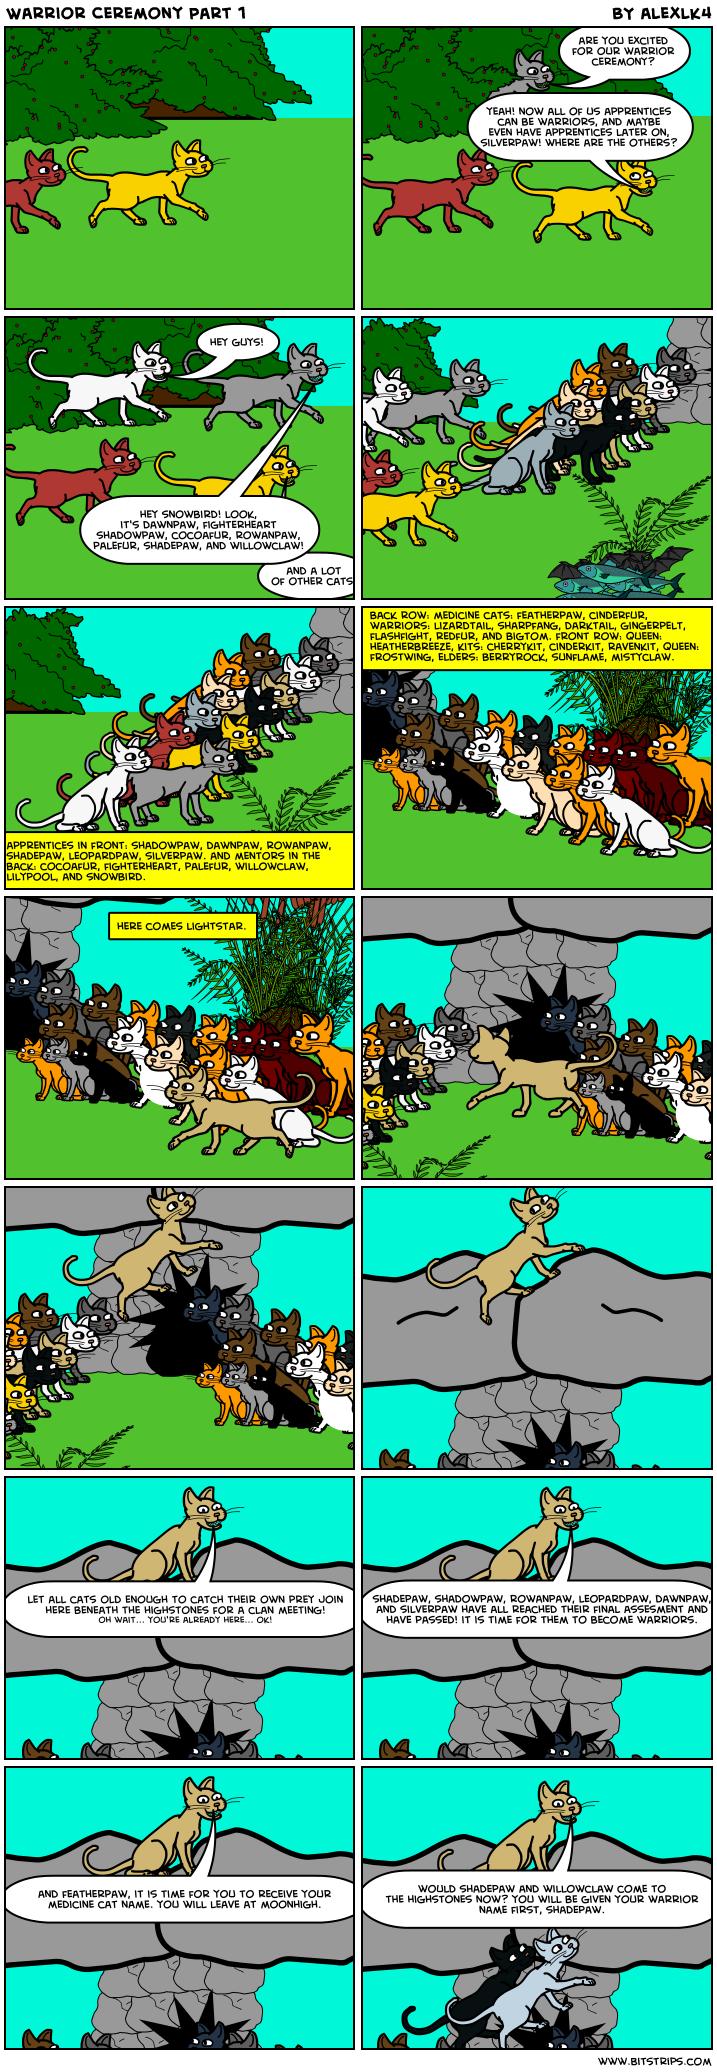 Warrior Ceremony Part 1